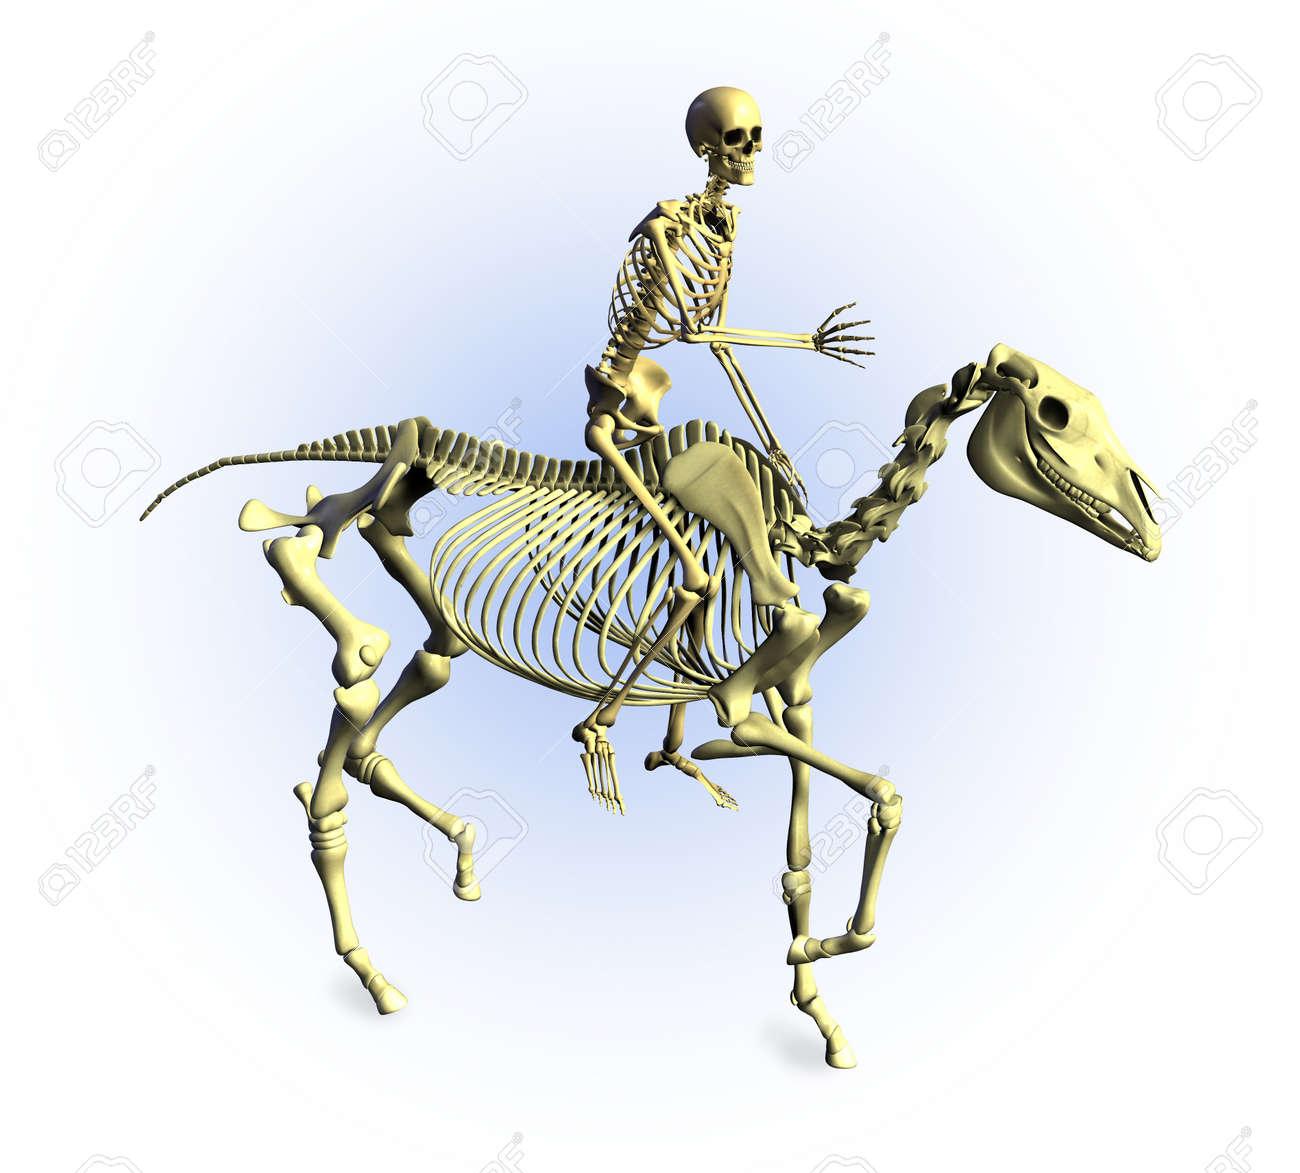 3d Render Of A Human Skeleton Riding A Skeleton Horse Stock Photo